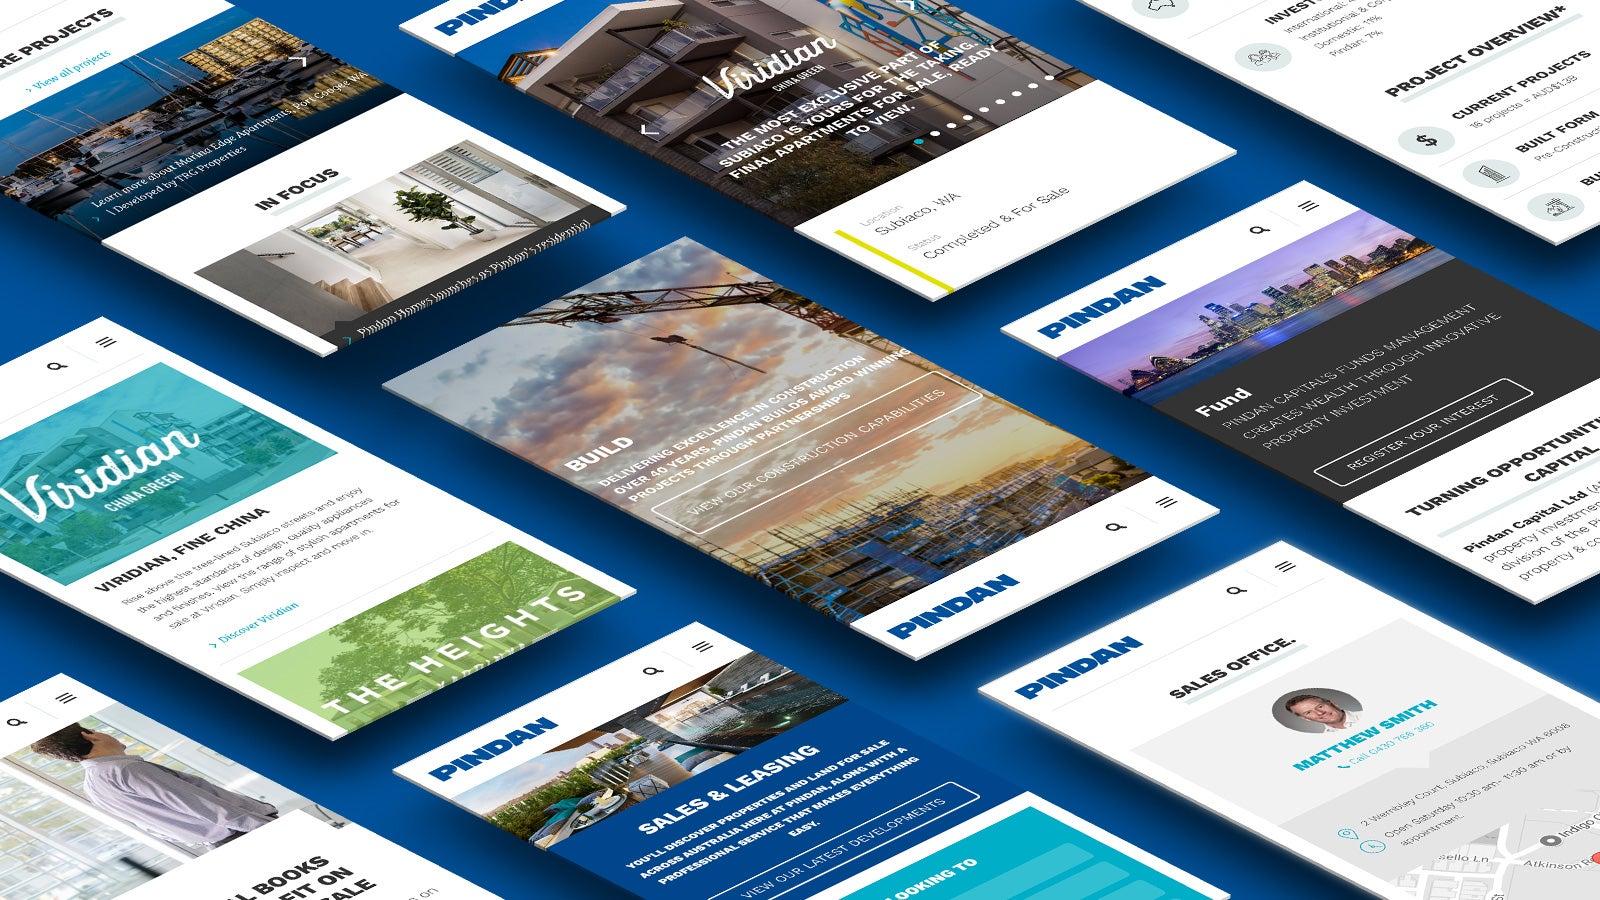 Pindan   mobile website pages   Devotion